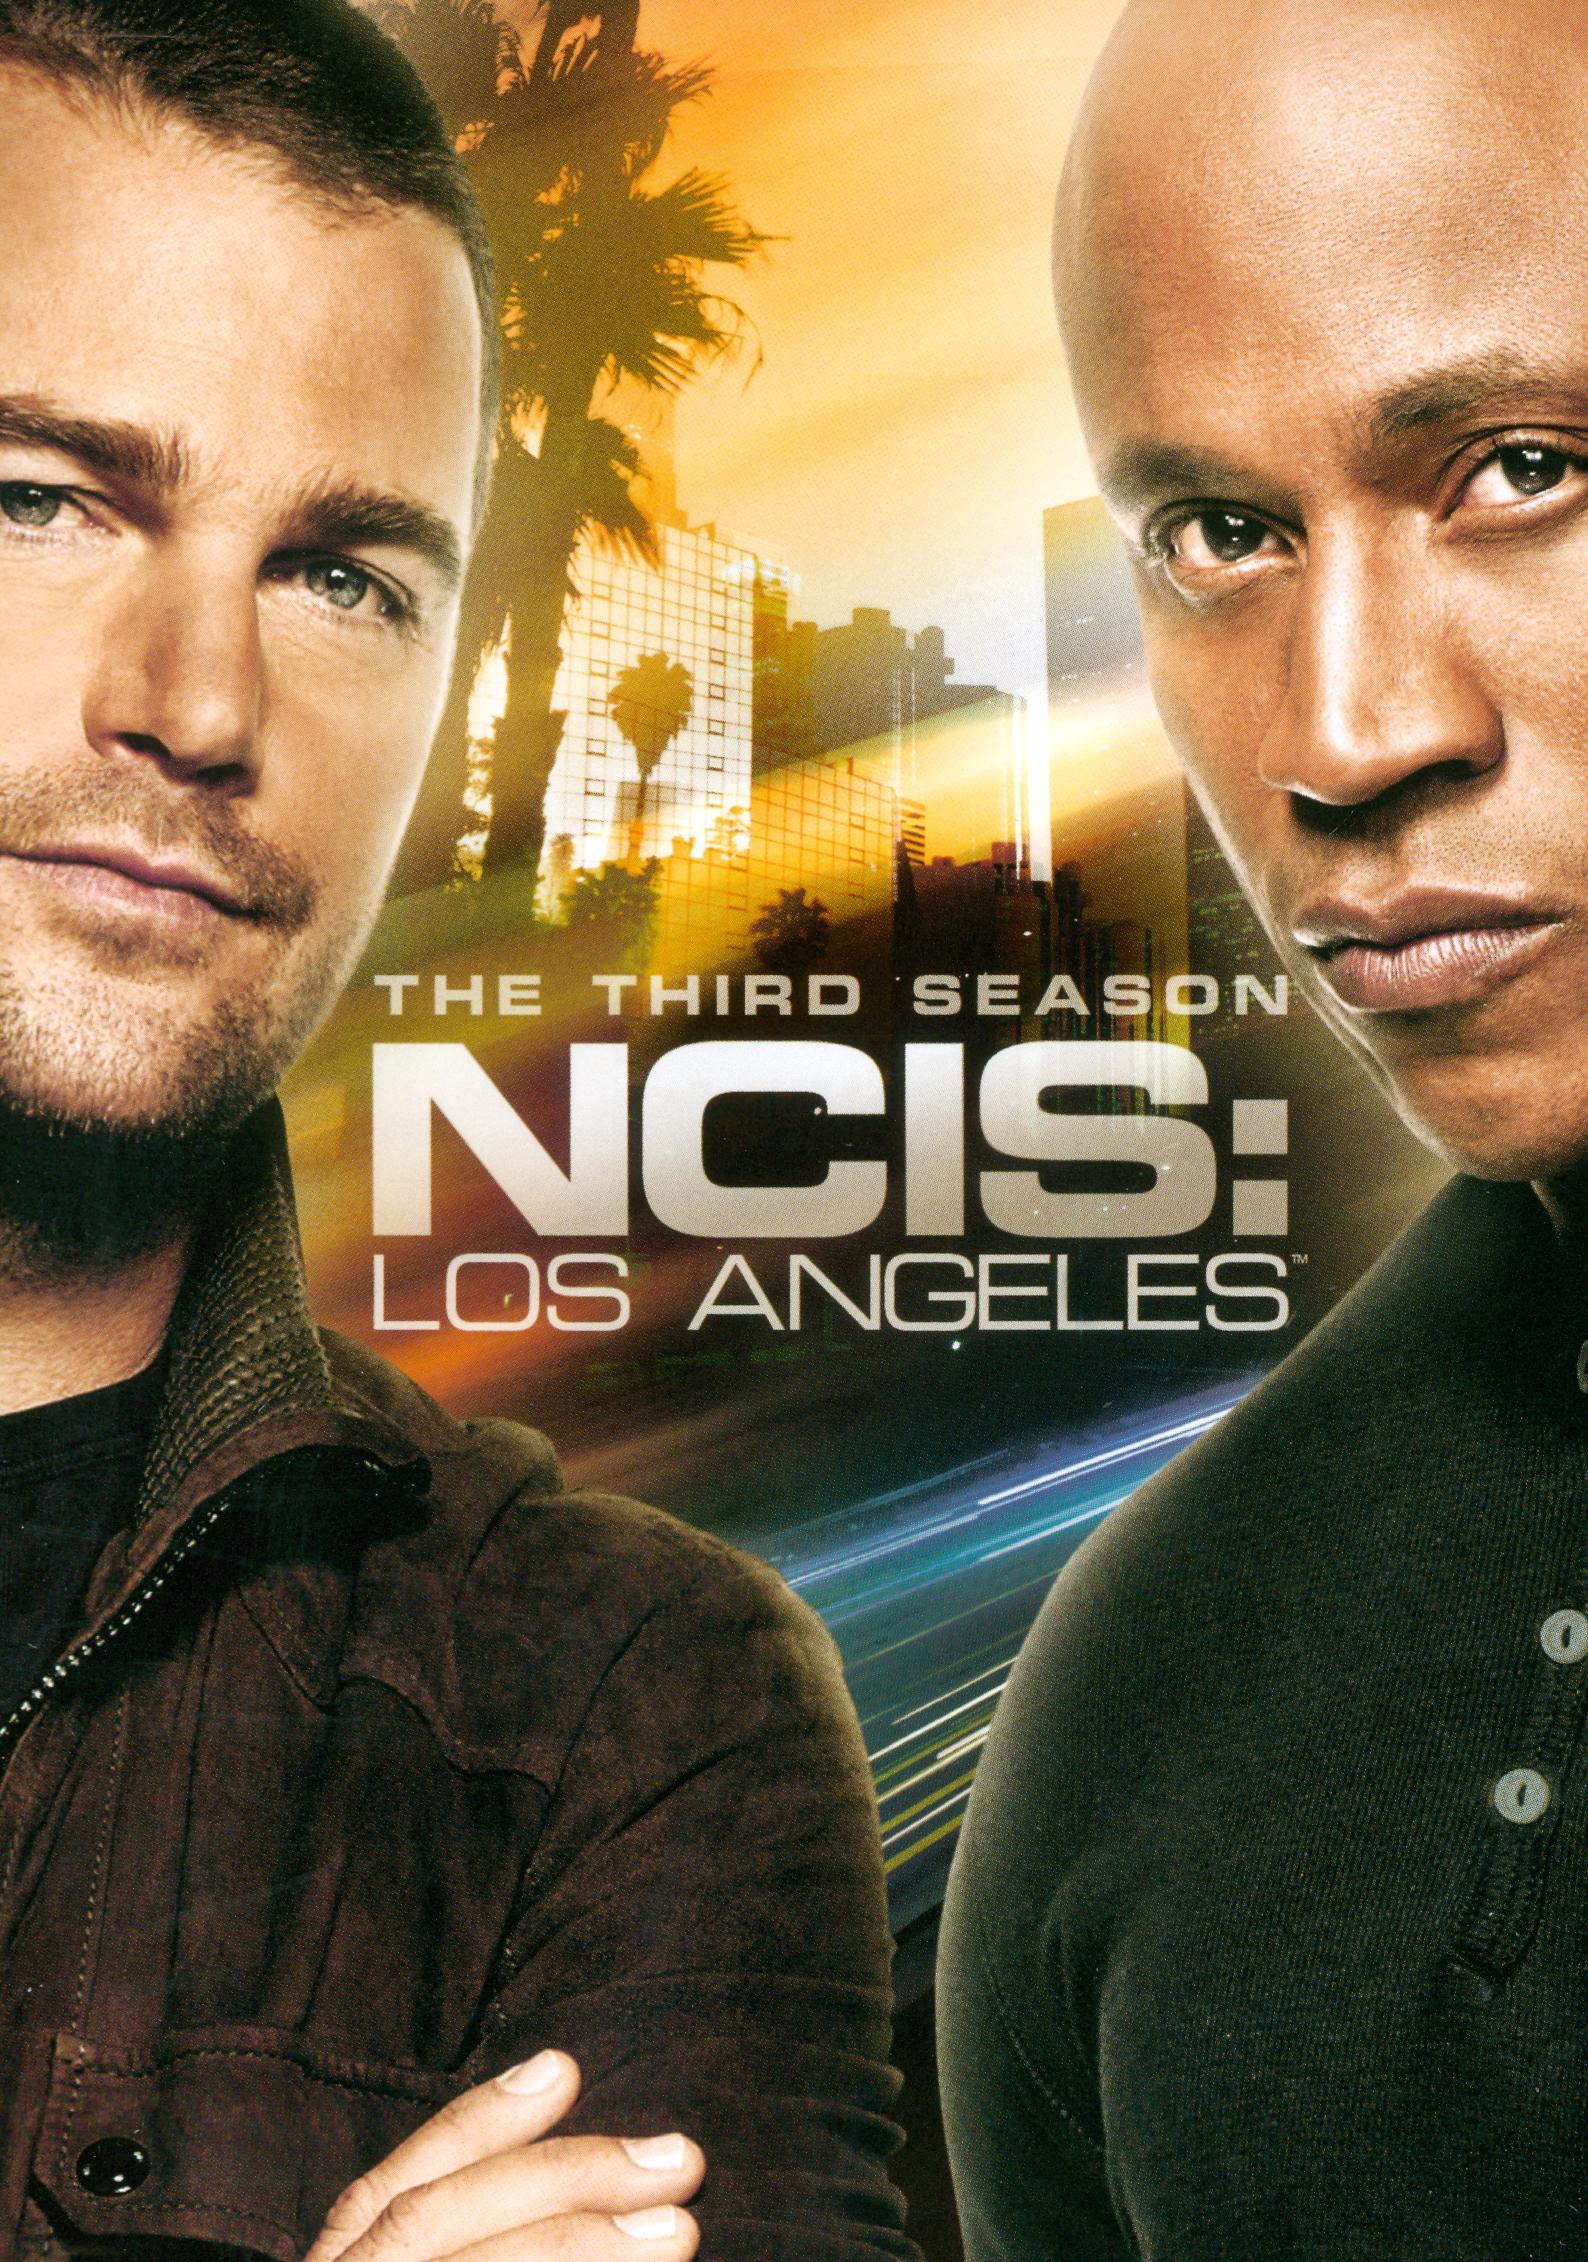 Ncis: Los Angeles - The Third Season [6 Discs] (dvd) 5995802